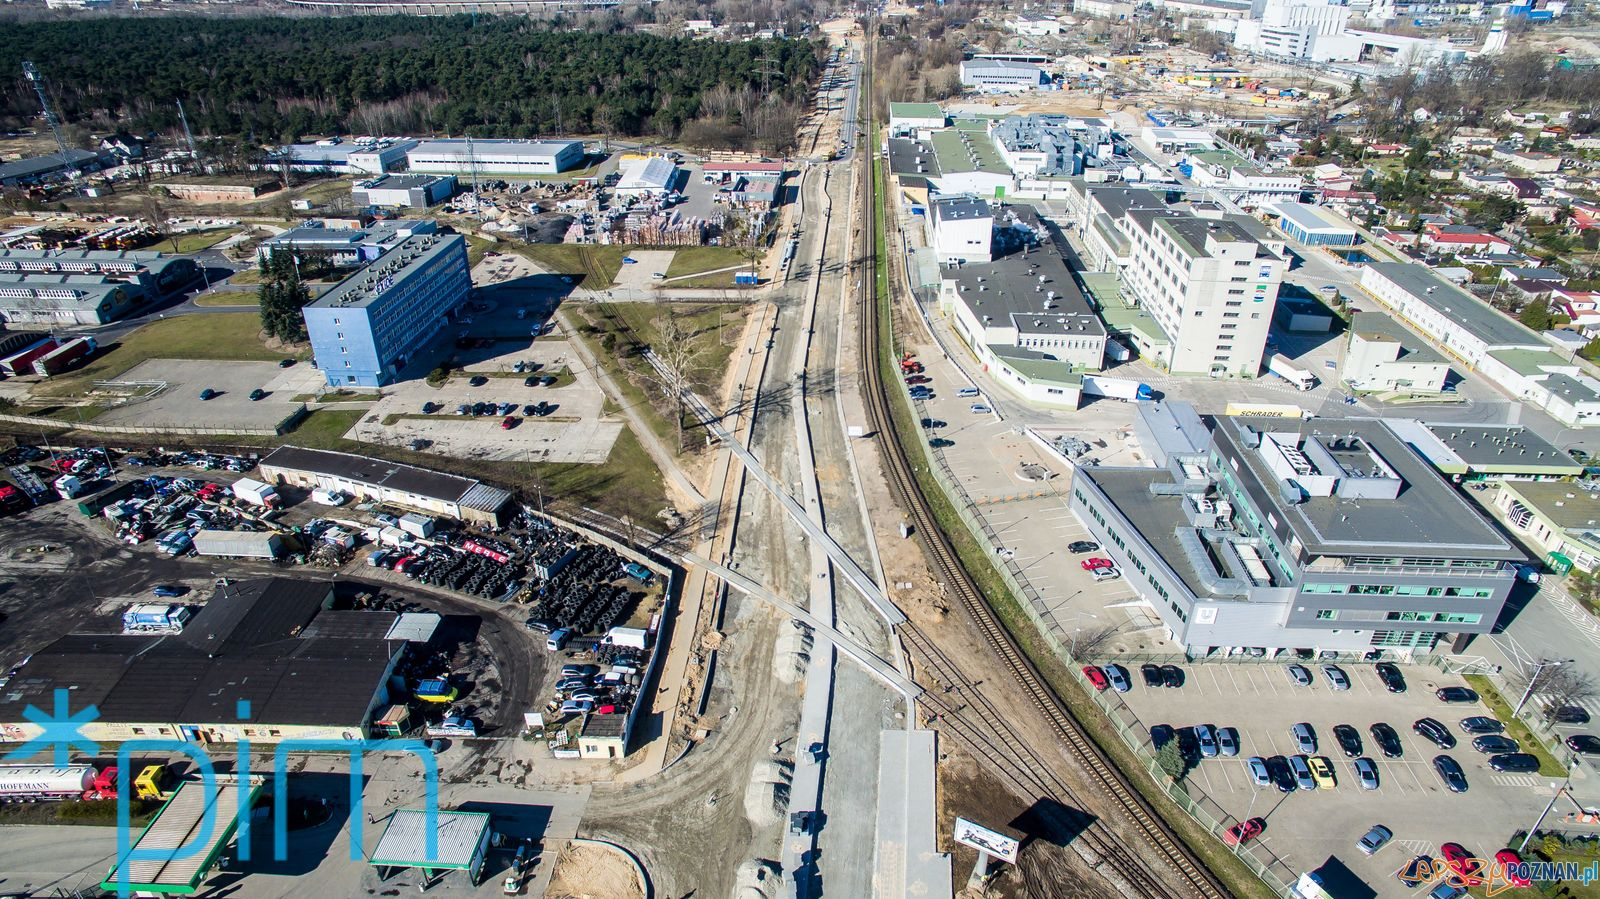 Bałtycka - Gdyńska - droga do spalarni  (10)  Foto: